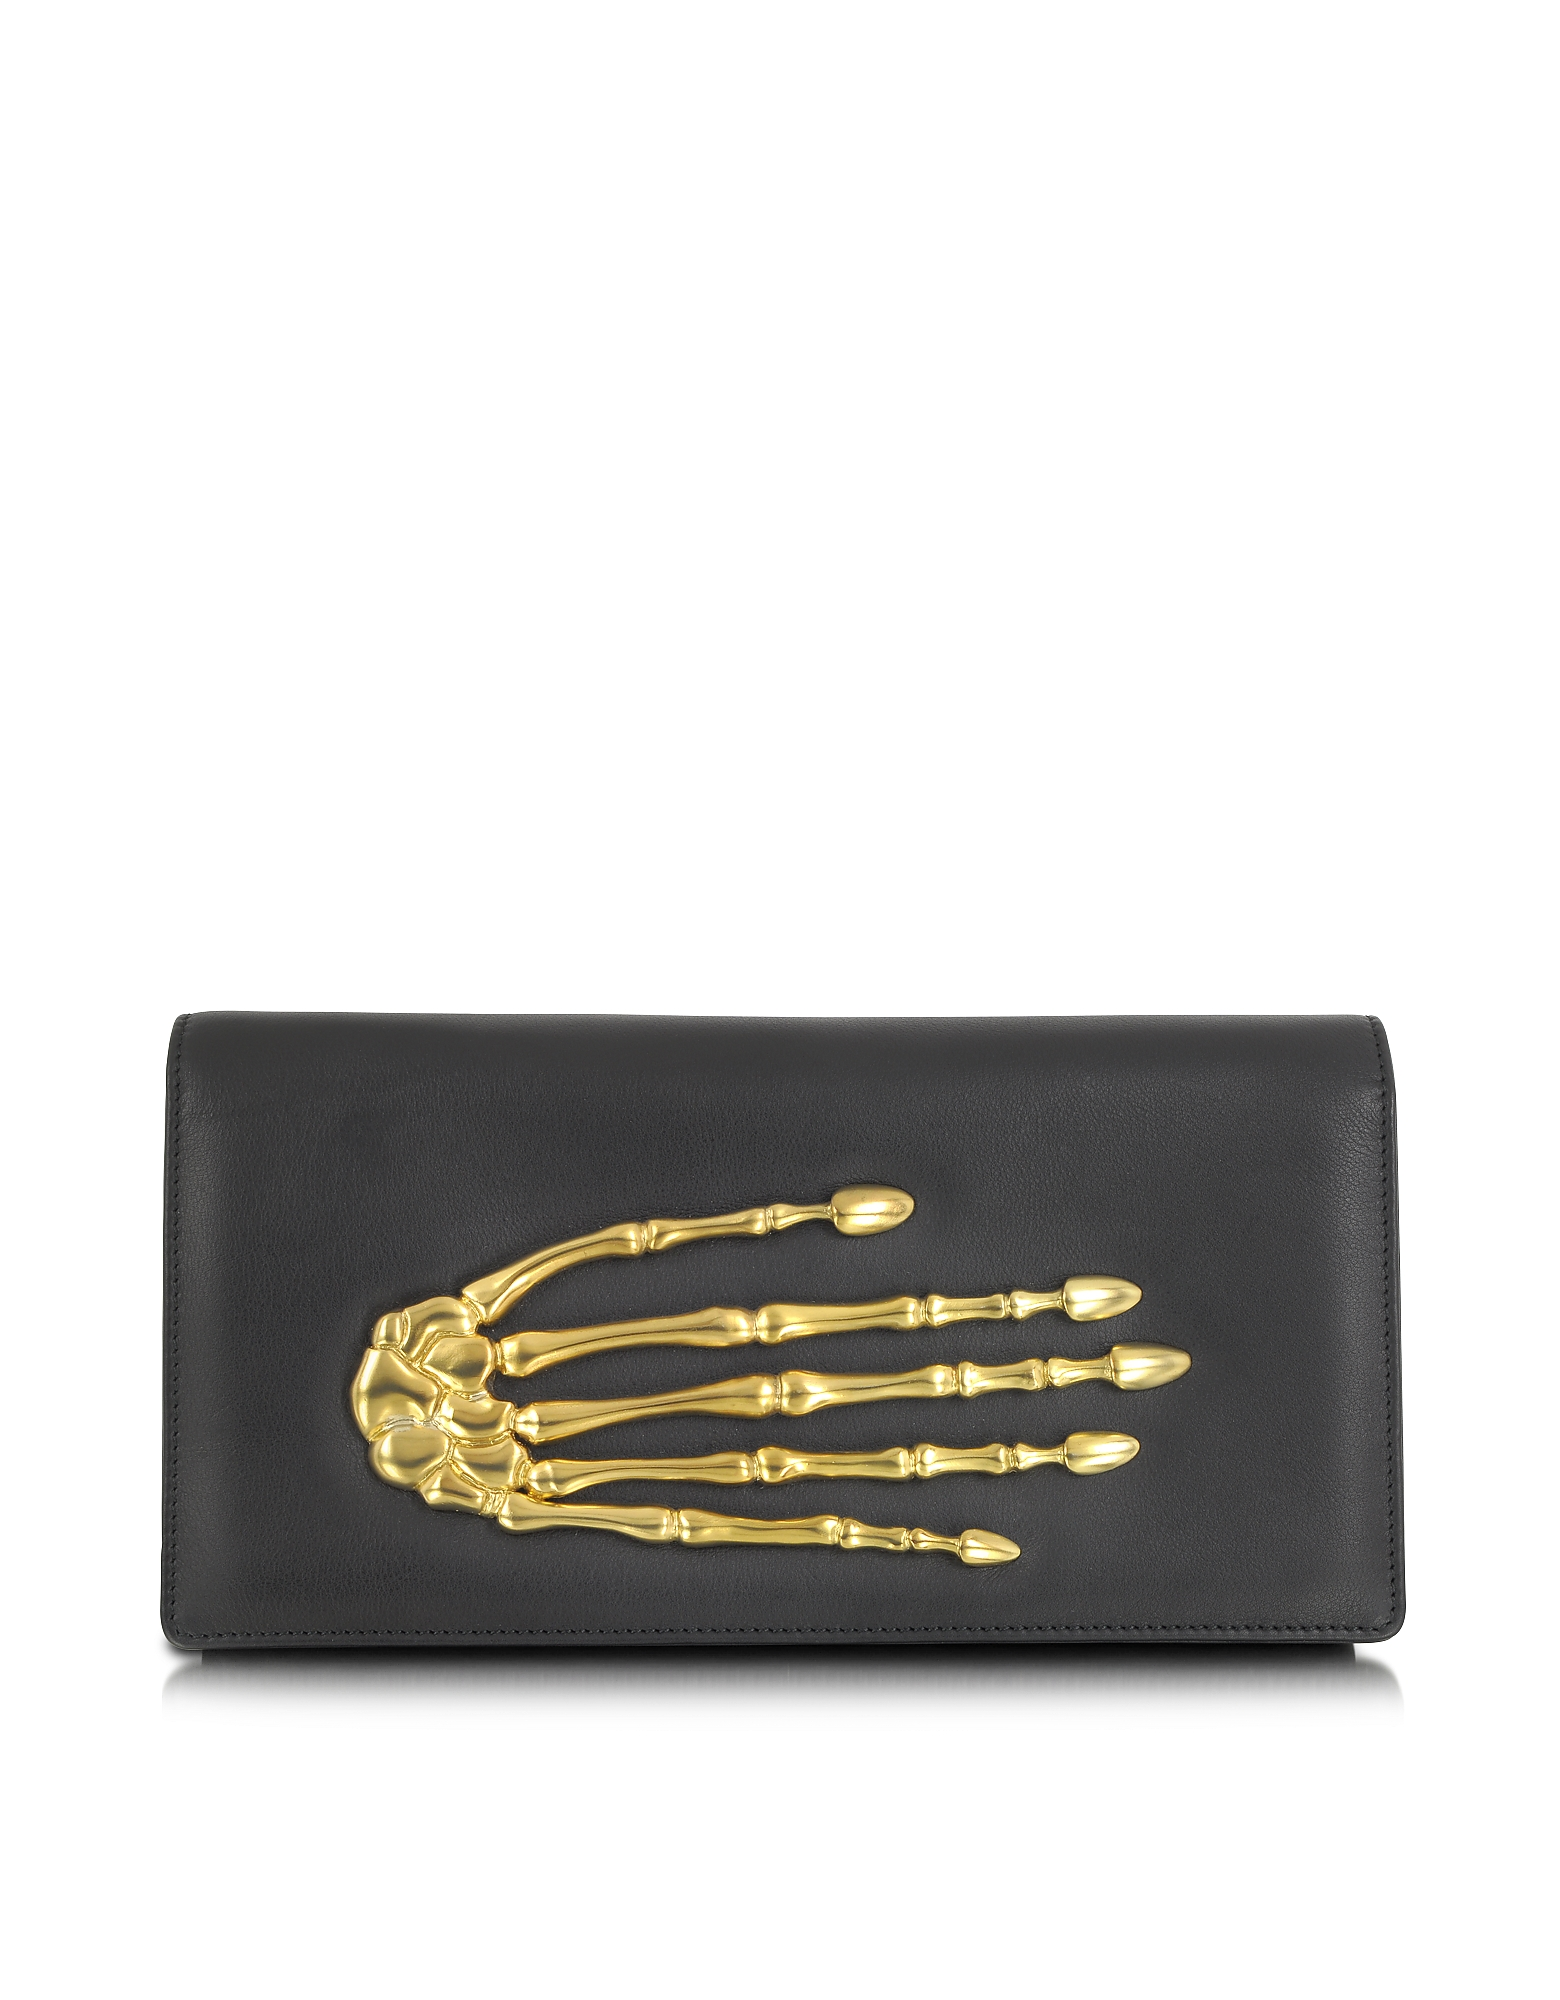 Skeleton Hand Clutch in Pelle con Mano Scheletro